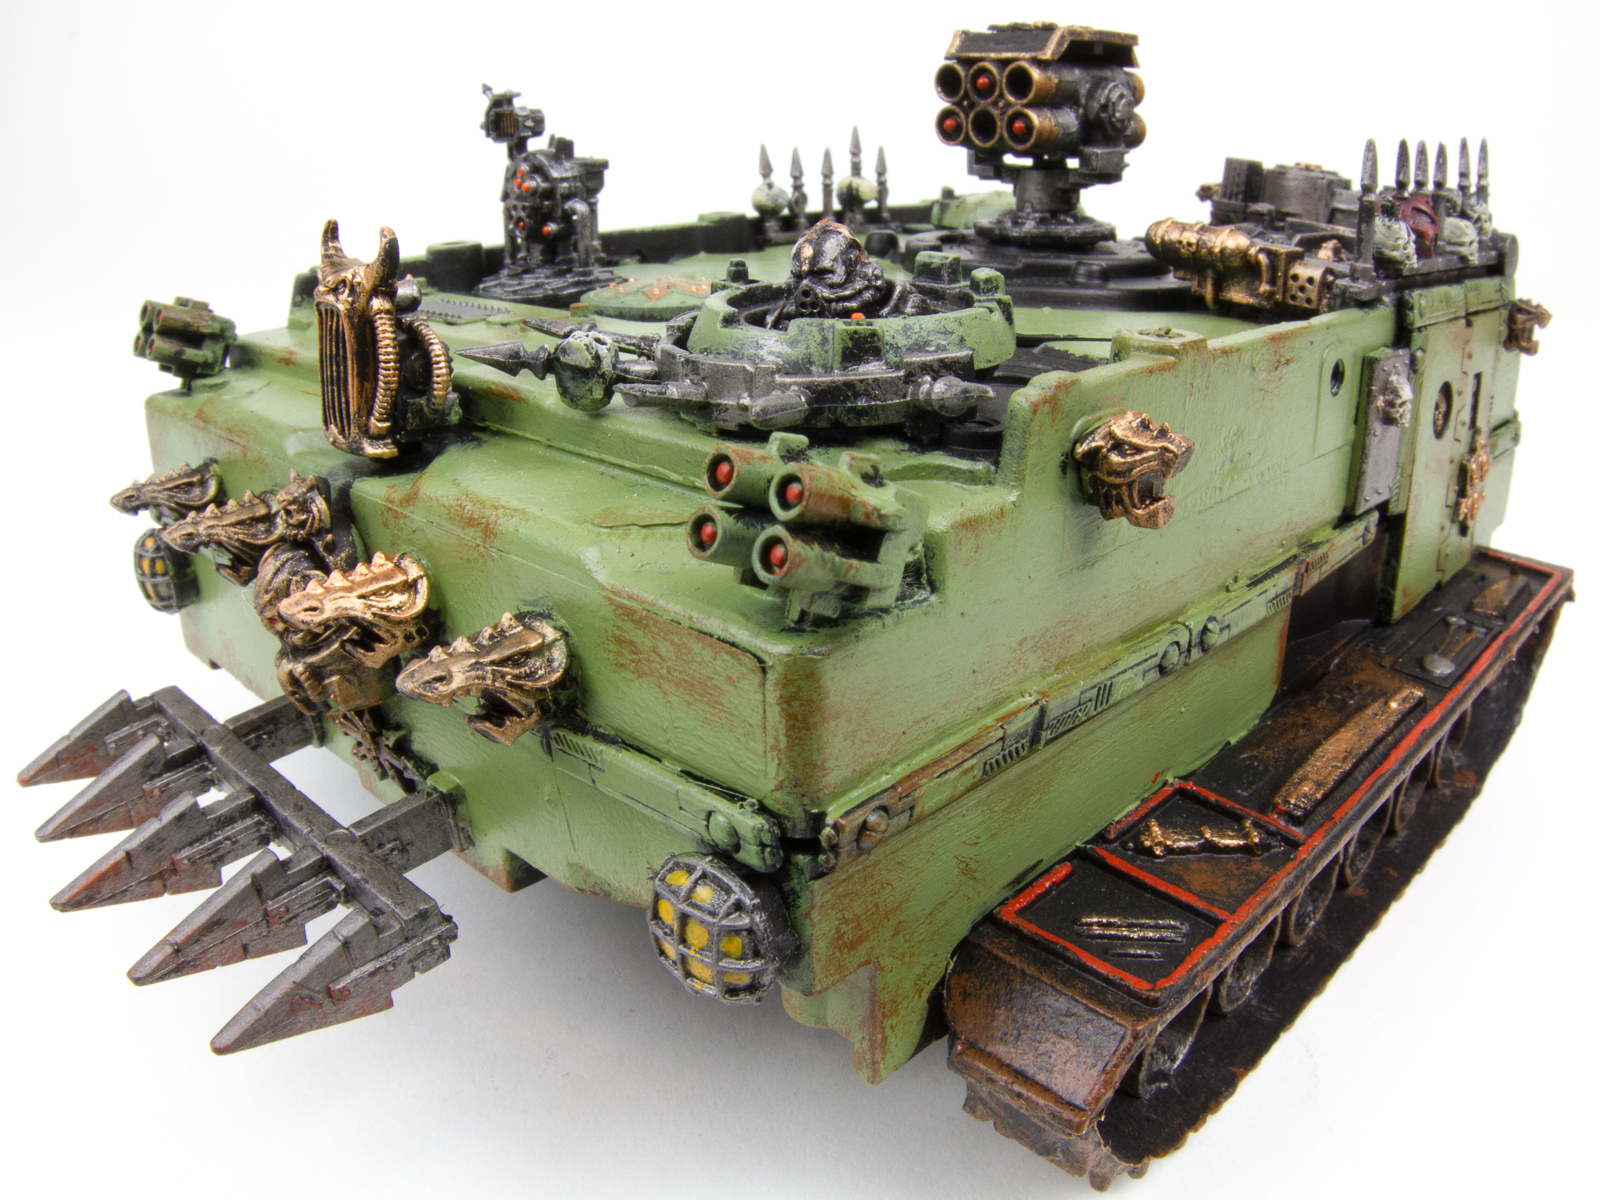 Warhammer 40K Nurgle Tanks from Hard Drives